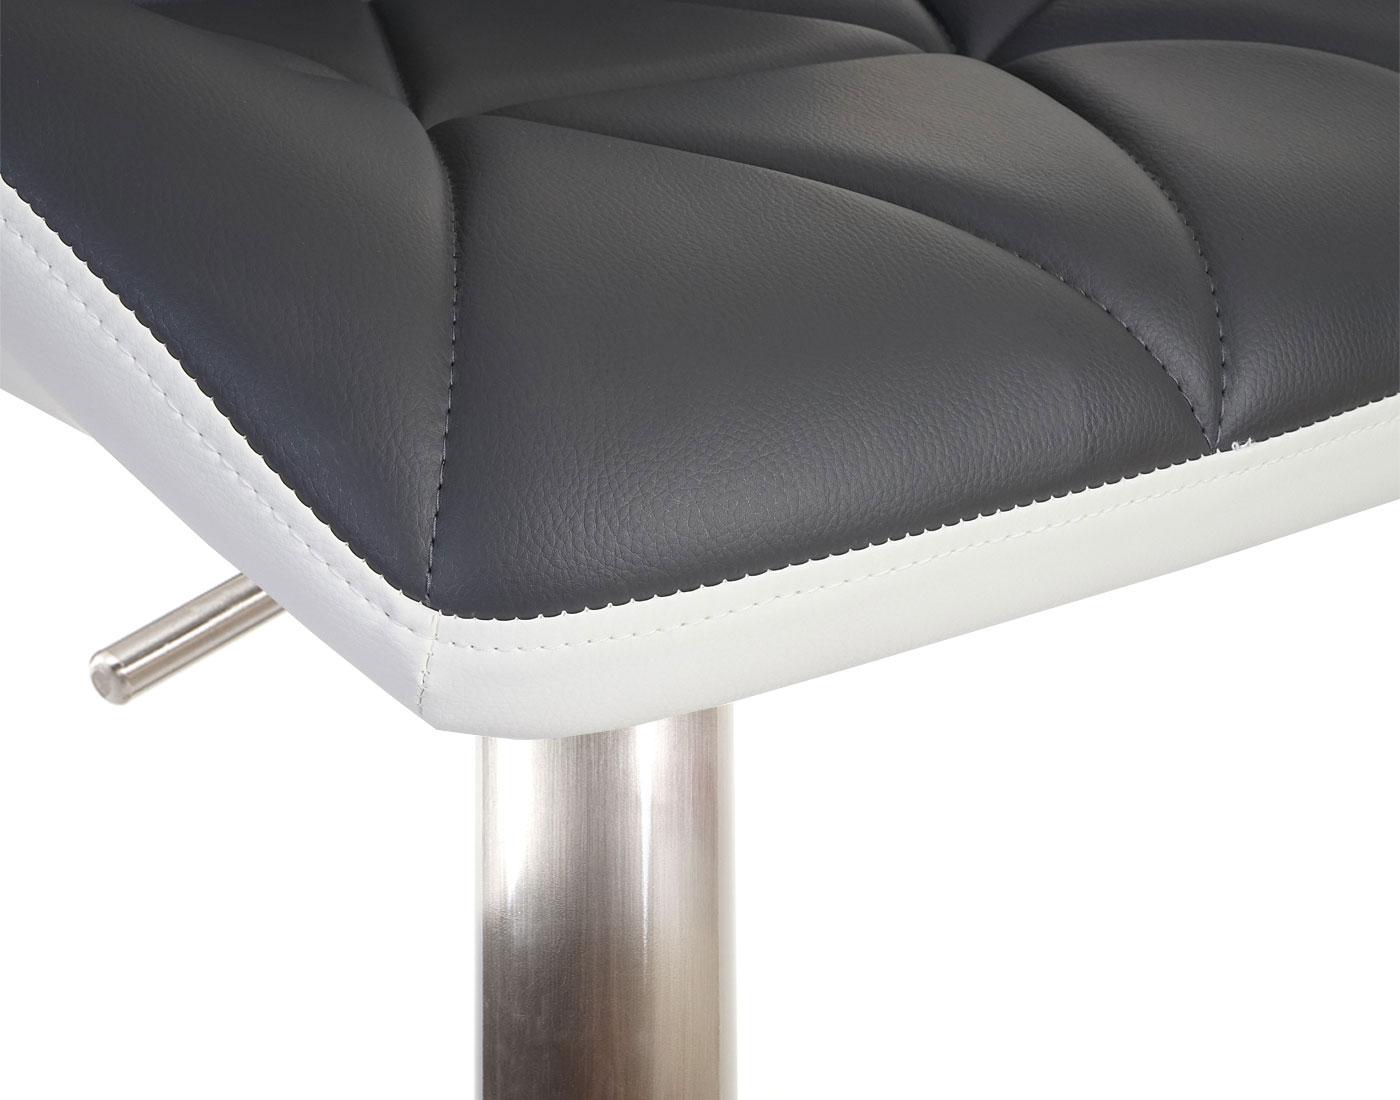 2x Barhocker HWC-A92, Kunstleder grau, Fuß gebürstet